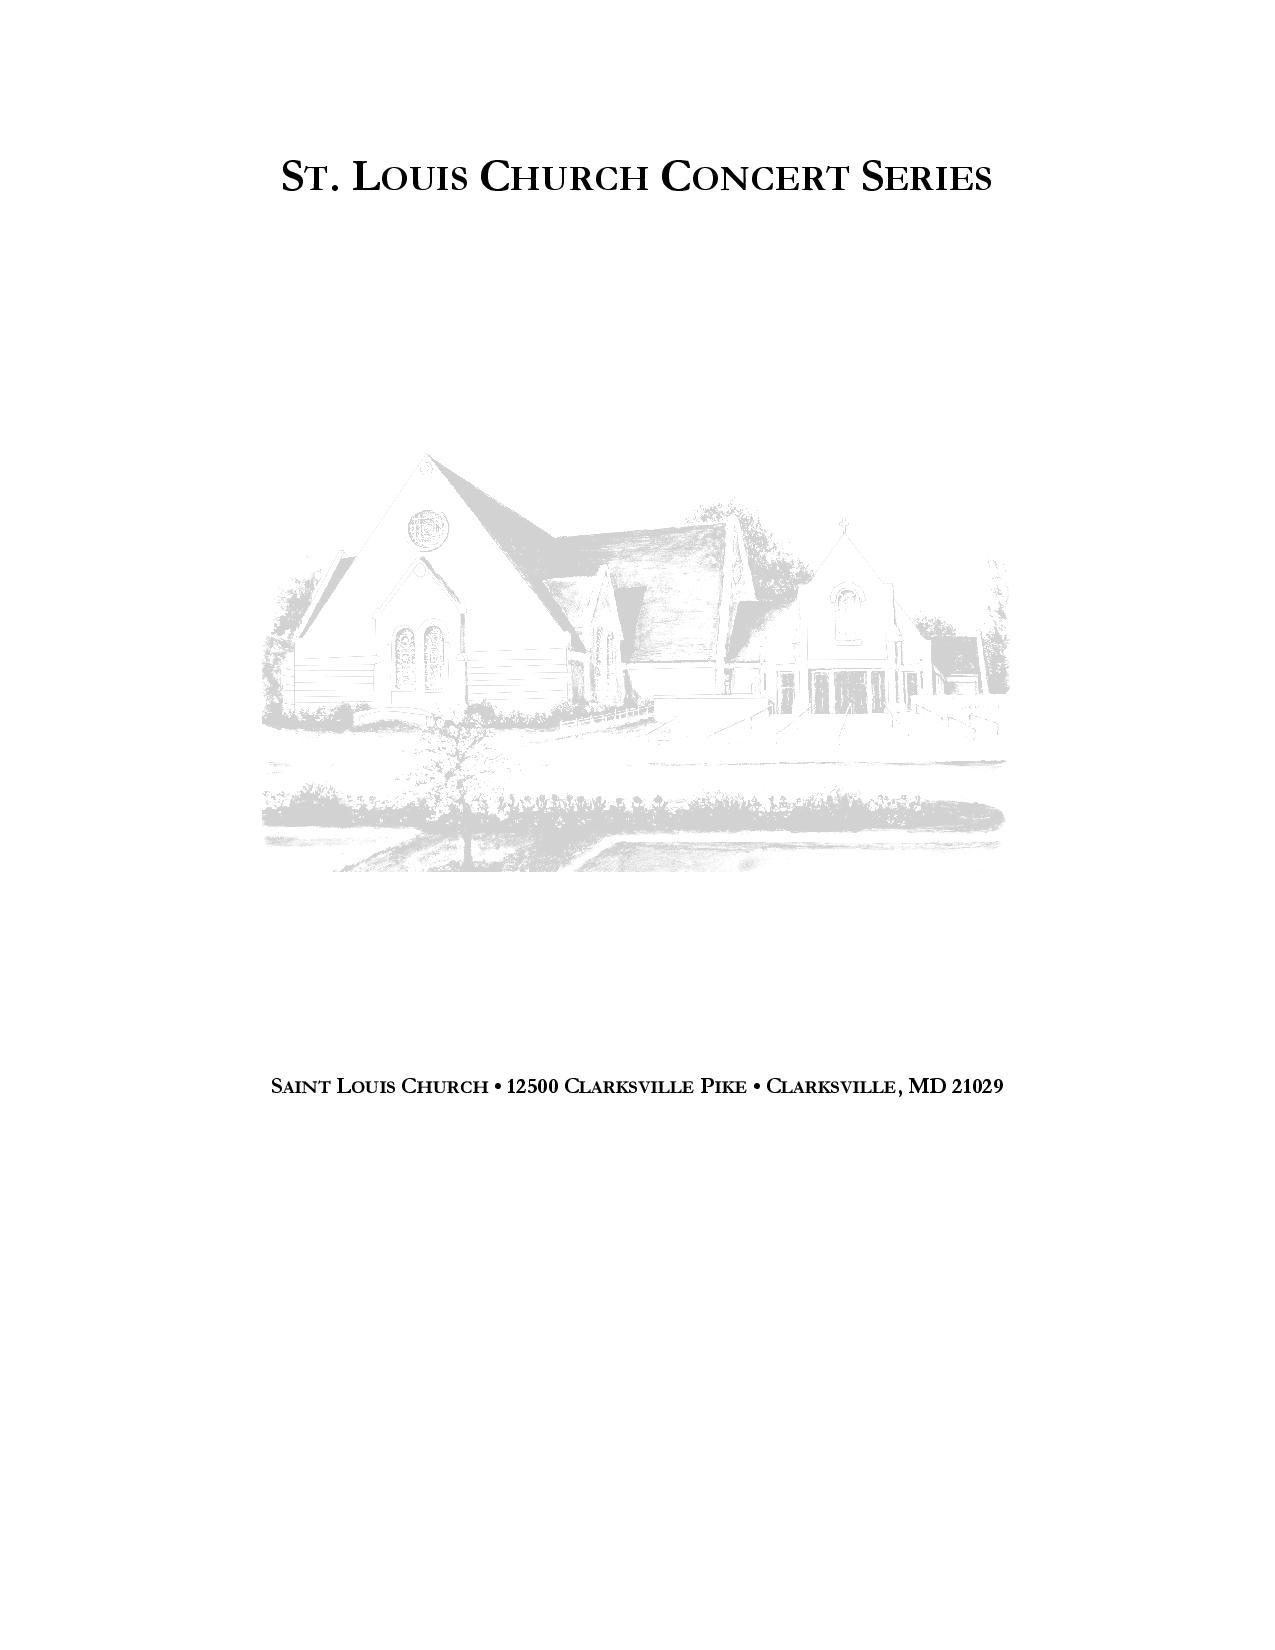 2009-04-26 - Program for Printing-page-012.jpg